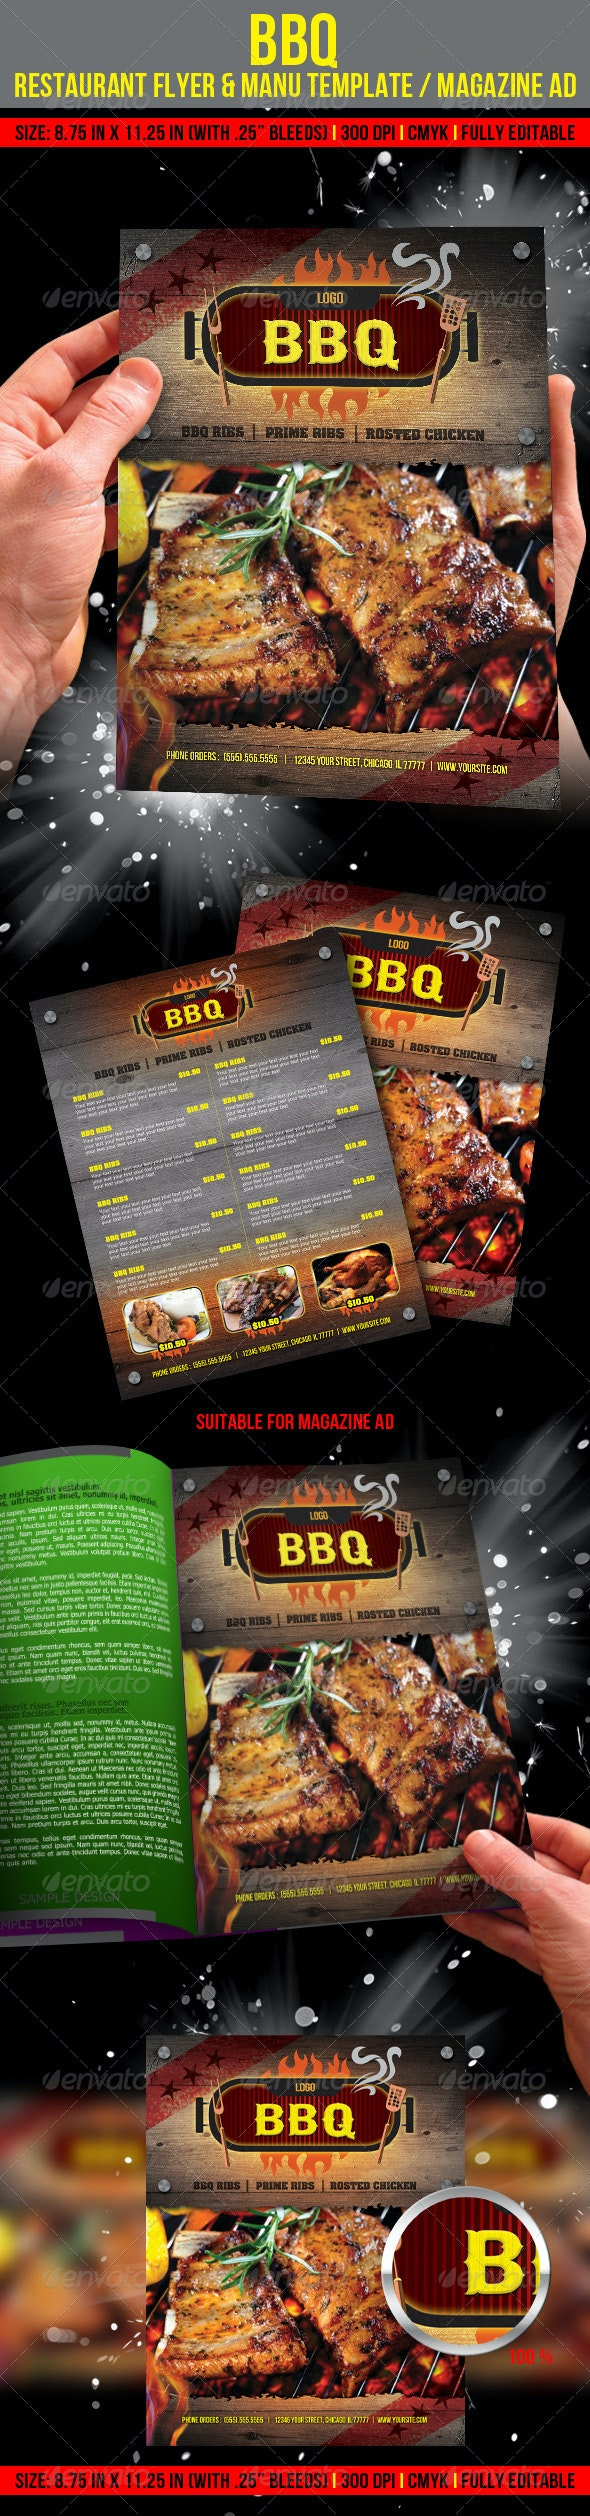 Barbecue Restaurant Flyer & Manu Template/ Magazin - Restaurant Flyers